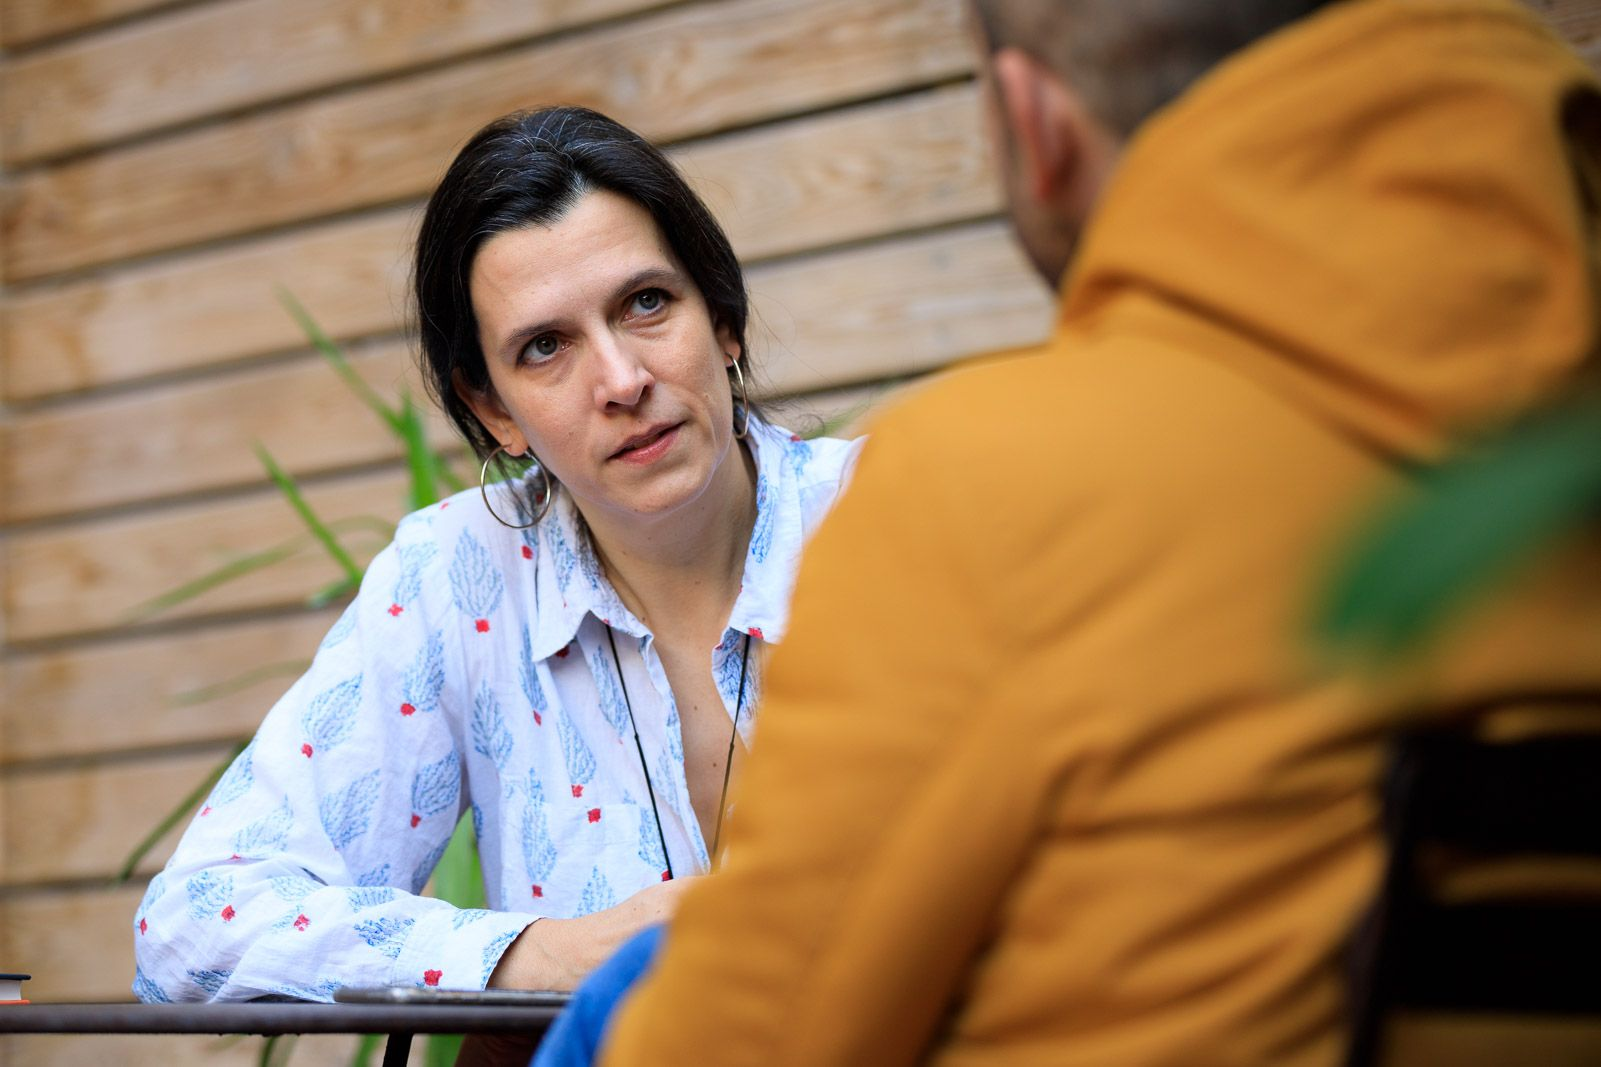 Carlota Gurt es declara feminista (JB)